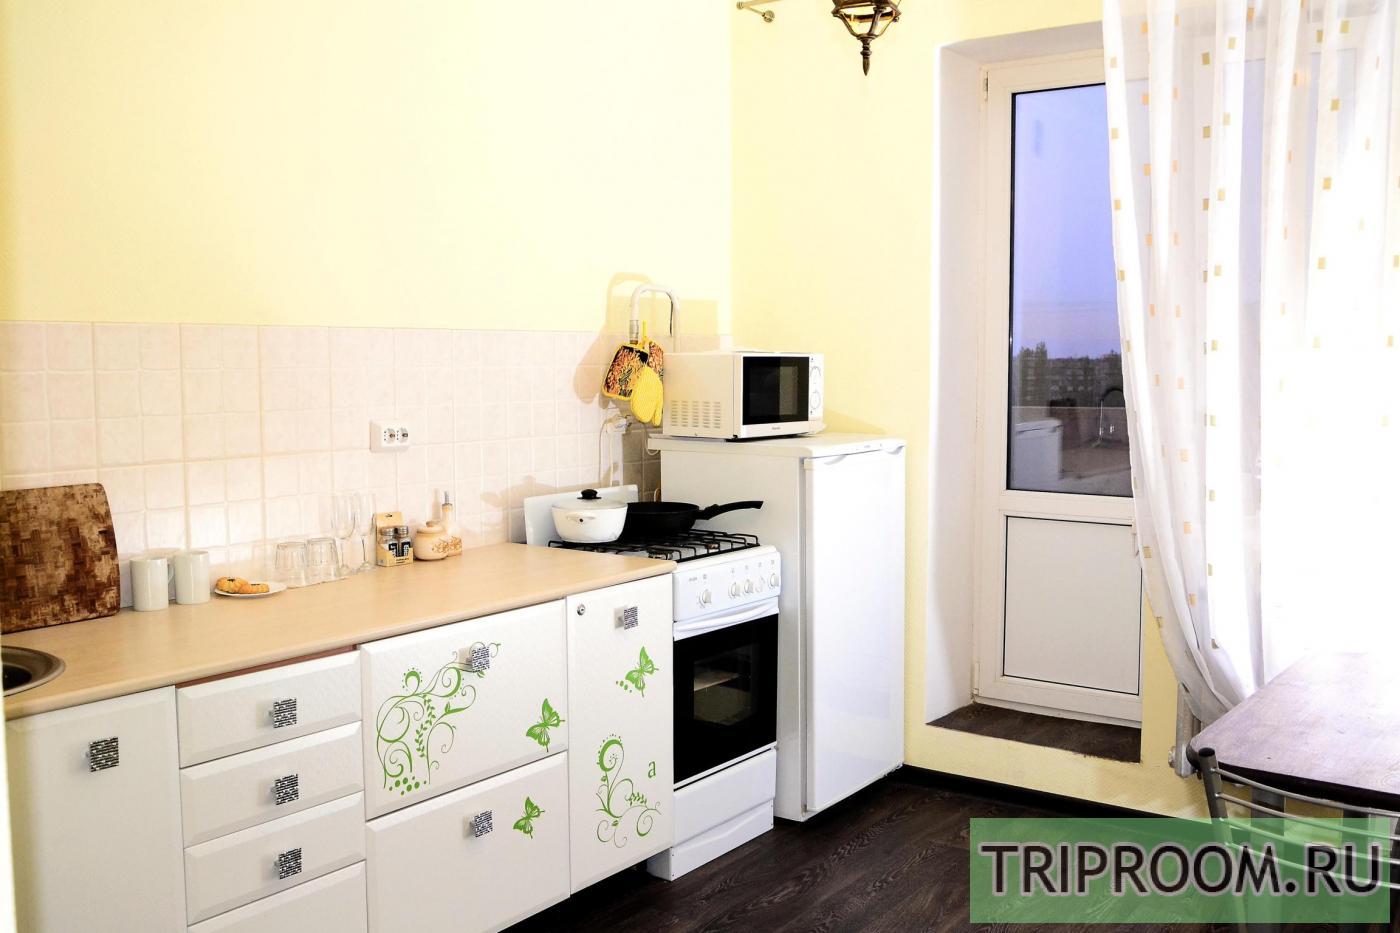 1-комнатная квартира посуточно (вариант № 14713), ул. Петра Смородина улица, фото № 18